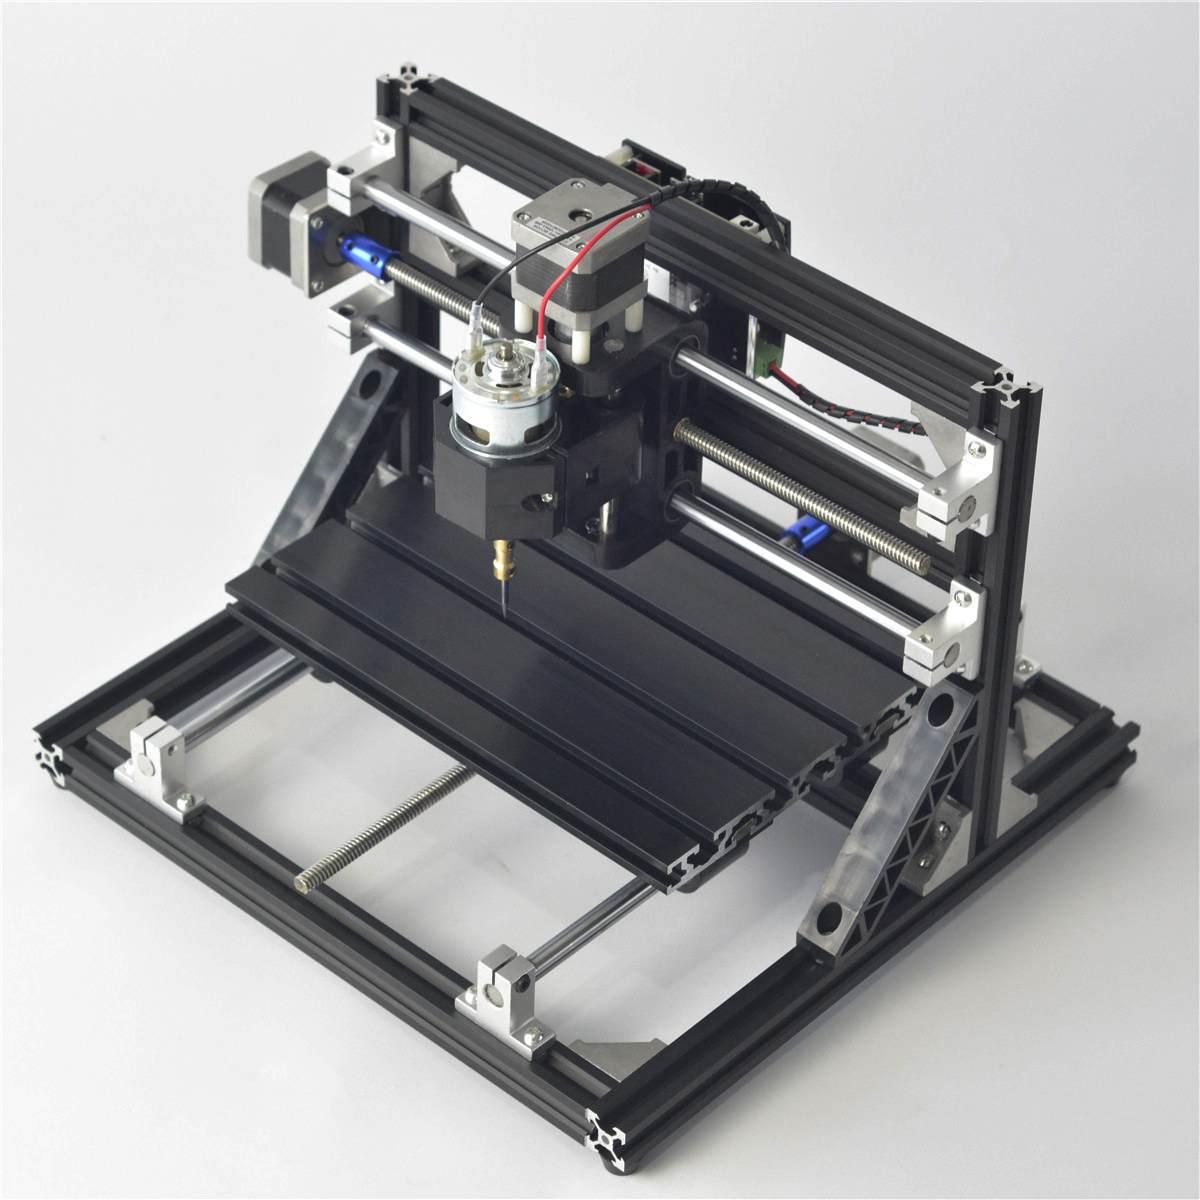 CNC3018 CNC2418 3 Axis Pcb Pvc Milling Machine Wood Router/Cutter/Printer Laser Engraving Mini Cnc Engraving MachineCNC3018 CNC2418 3 Axis Pcb Pvc Milling Machine Wood Router/Cutter/Printer Laser Engraving Mini Cnc Engraving Machine